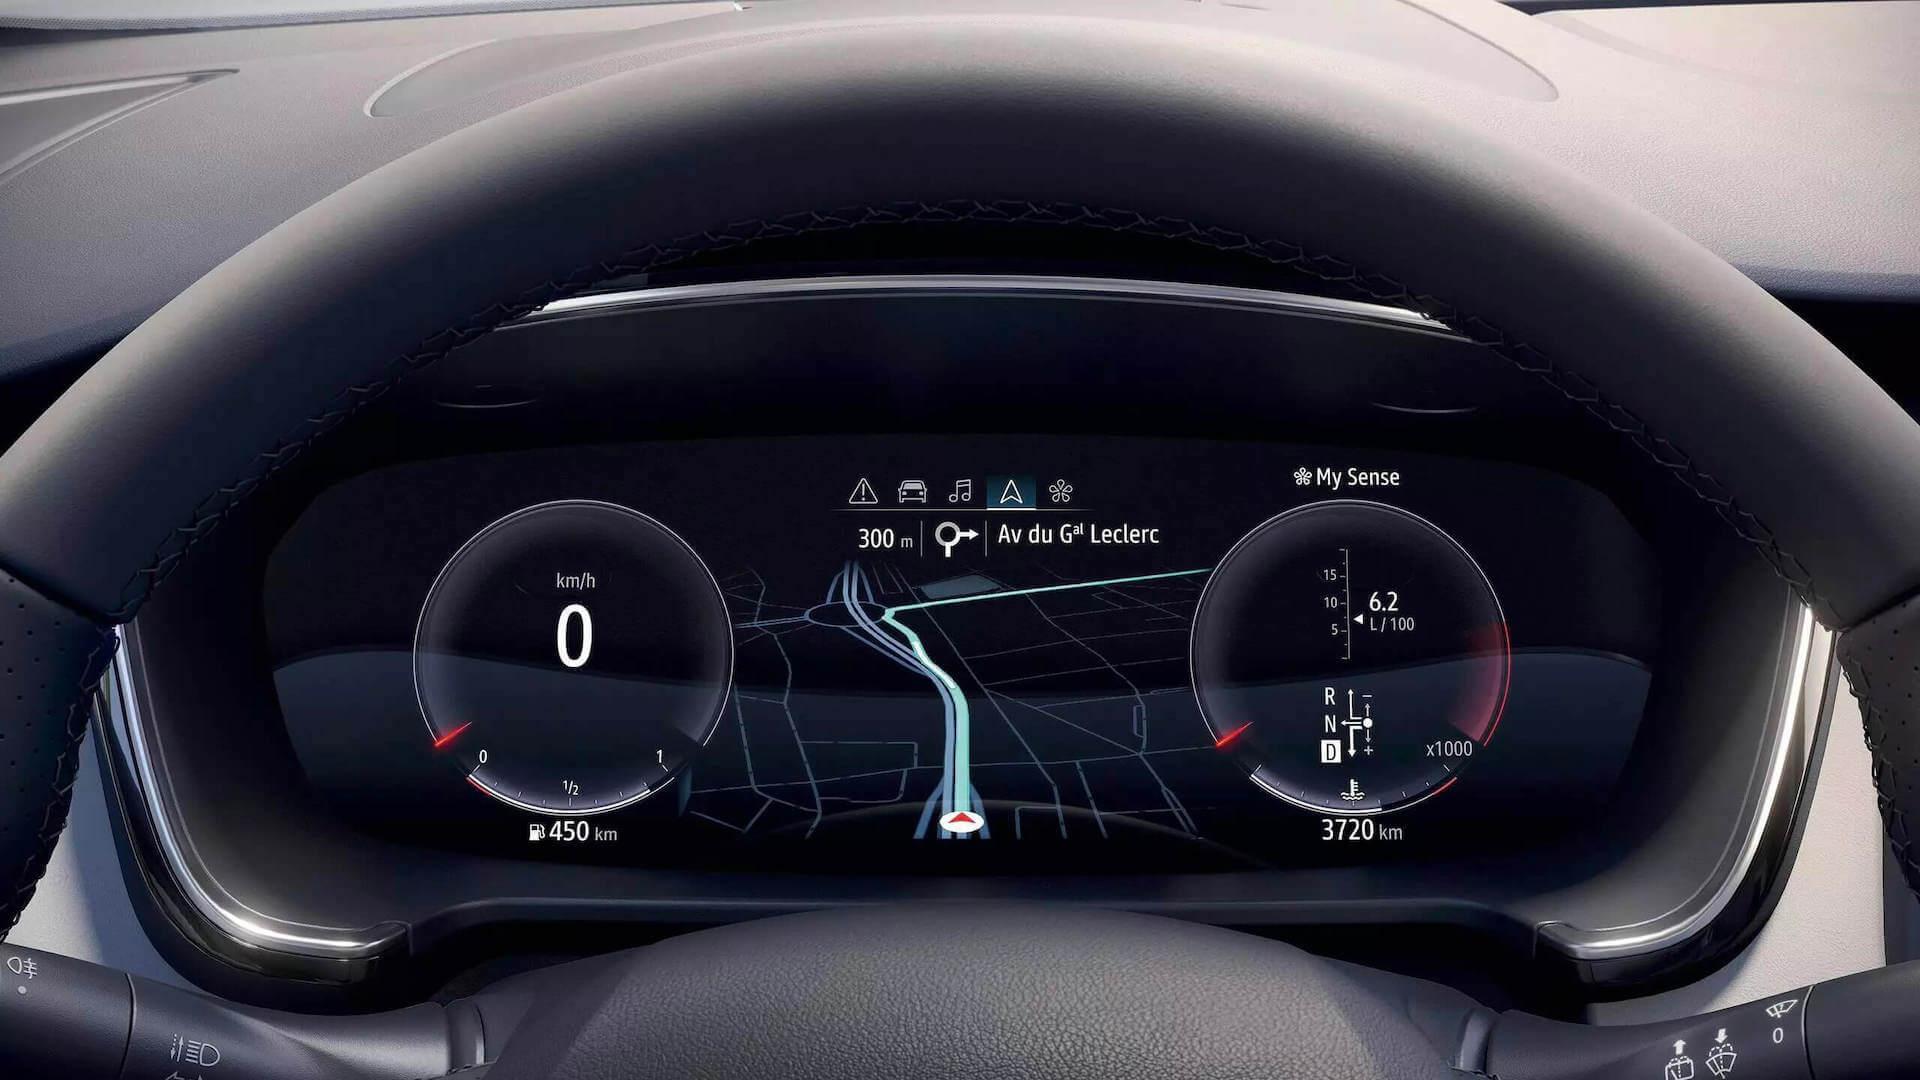 Tachoeinheit vom Auto am Lenkrad - Renault Talisman - Renault Ahrens Hannover